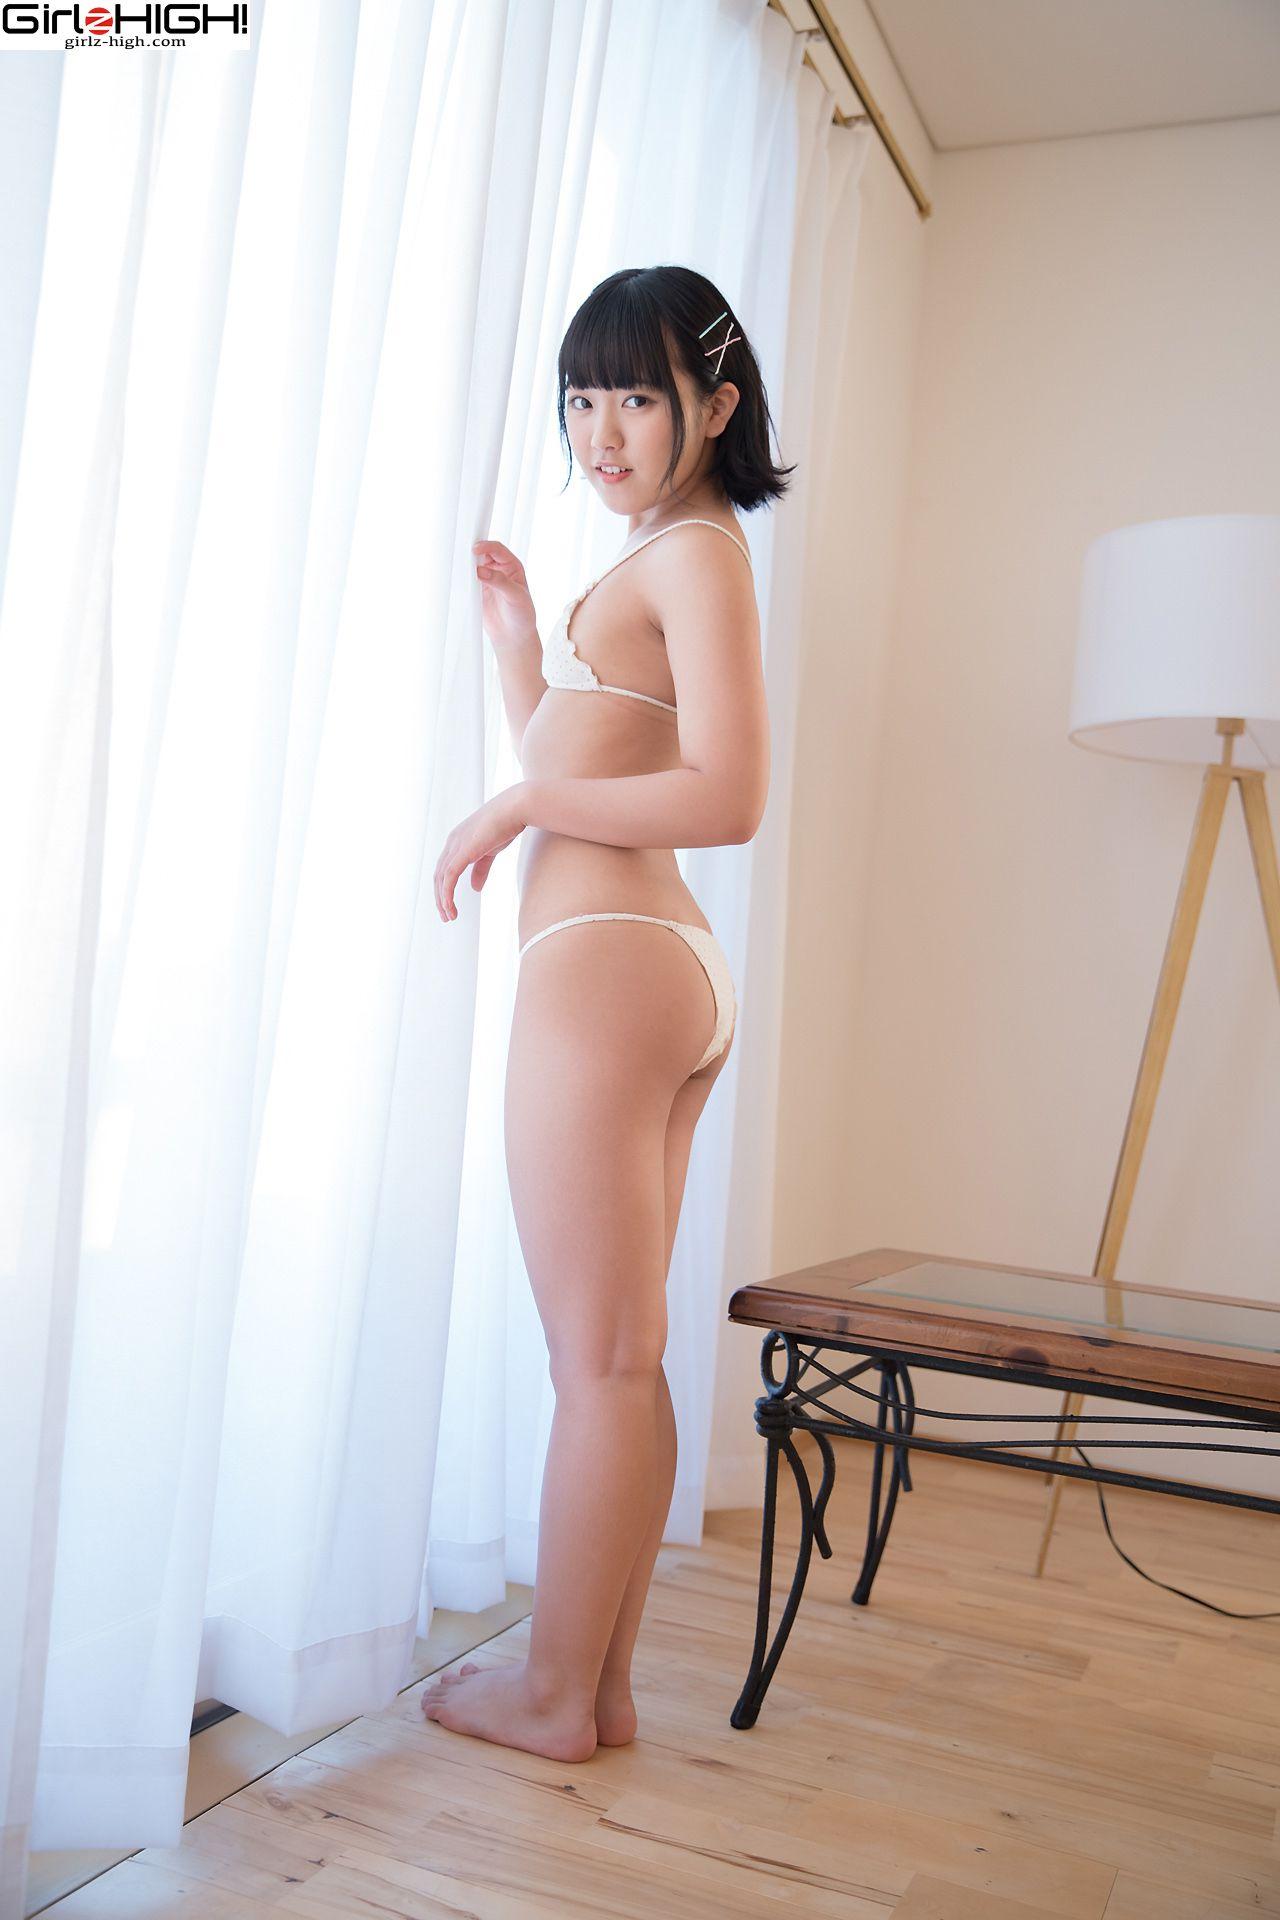 VOL.522 [Girlz-High]日本少妇平胸:香月杏珠(香月りお)超高清写真套图(53P)